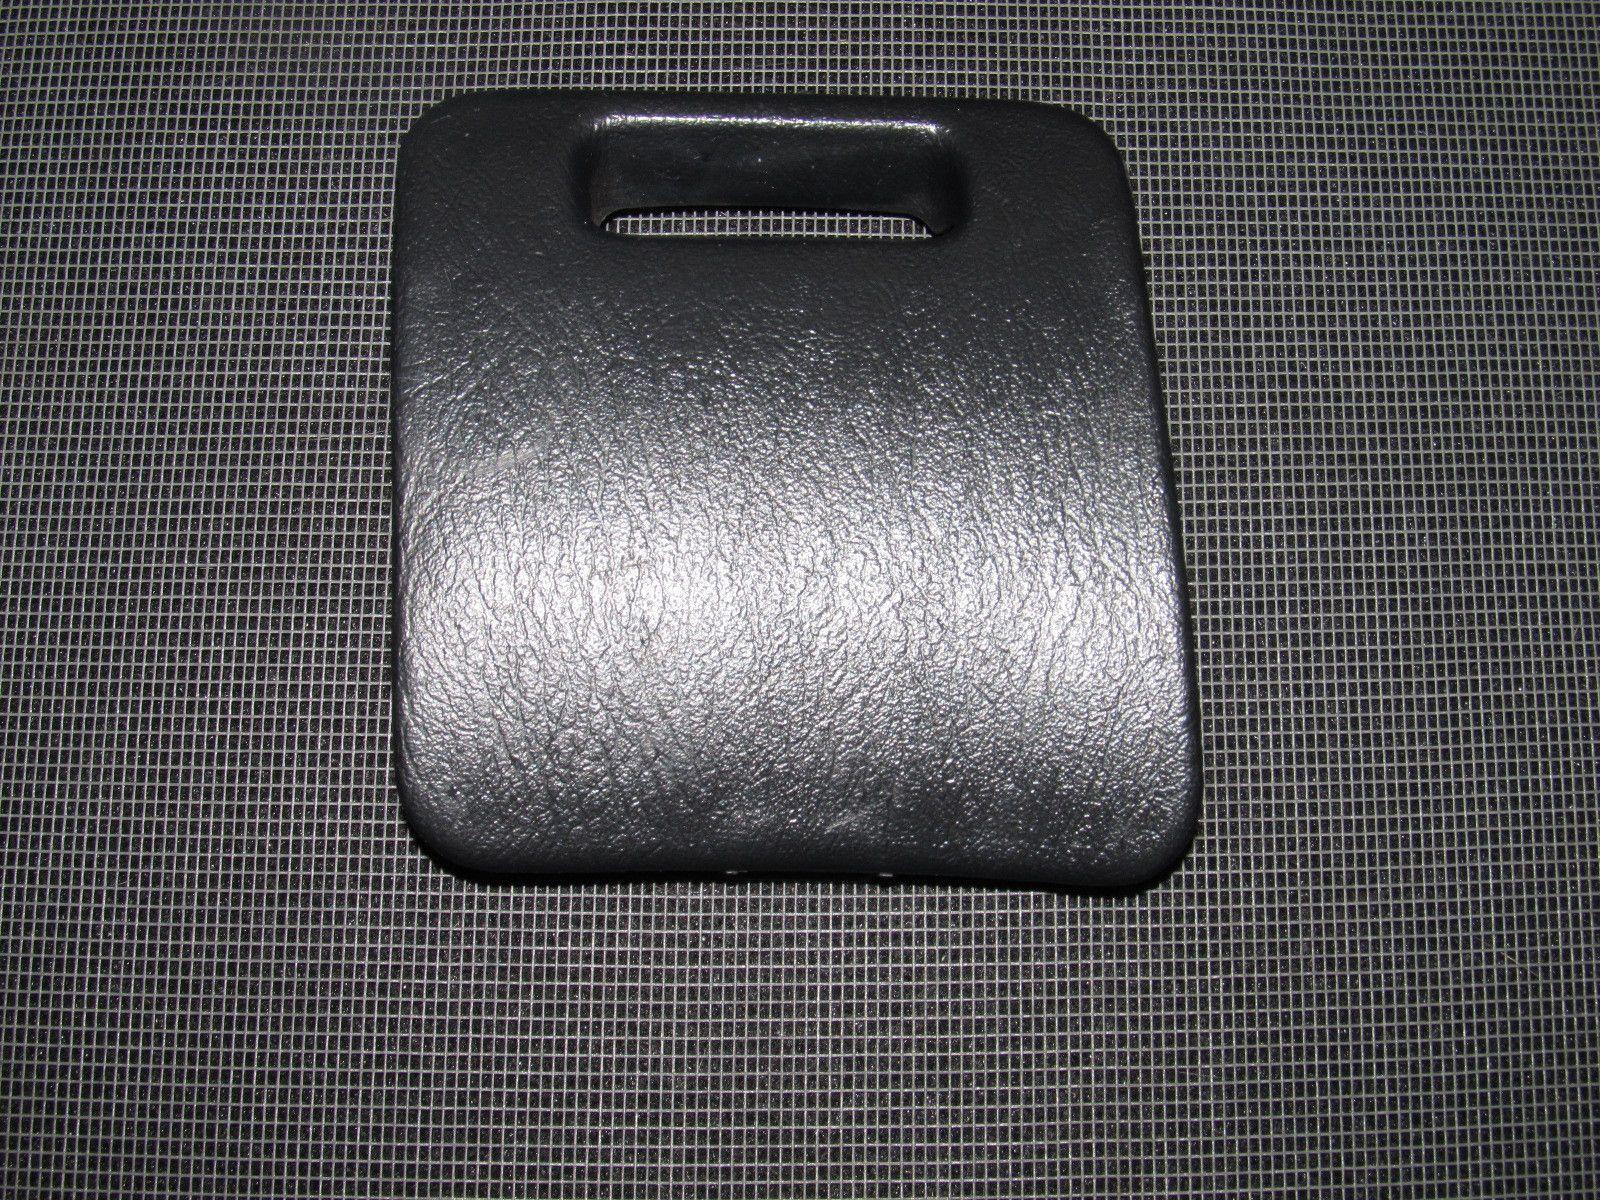 94 95 96 97 98 99 Toyota Celica OEM Interior Fuse Box Cover